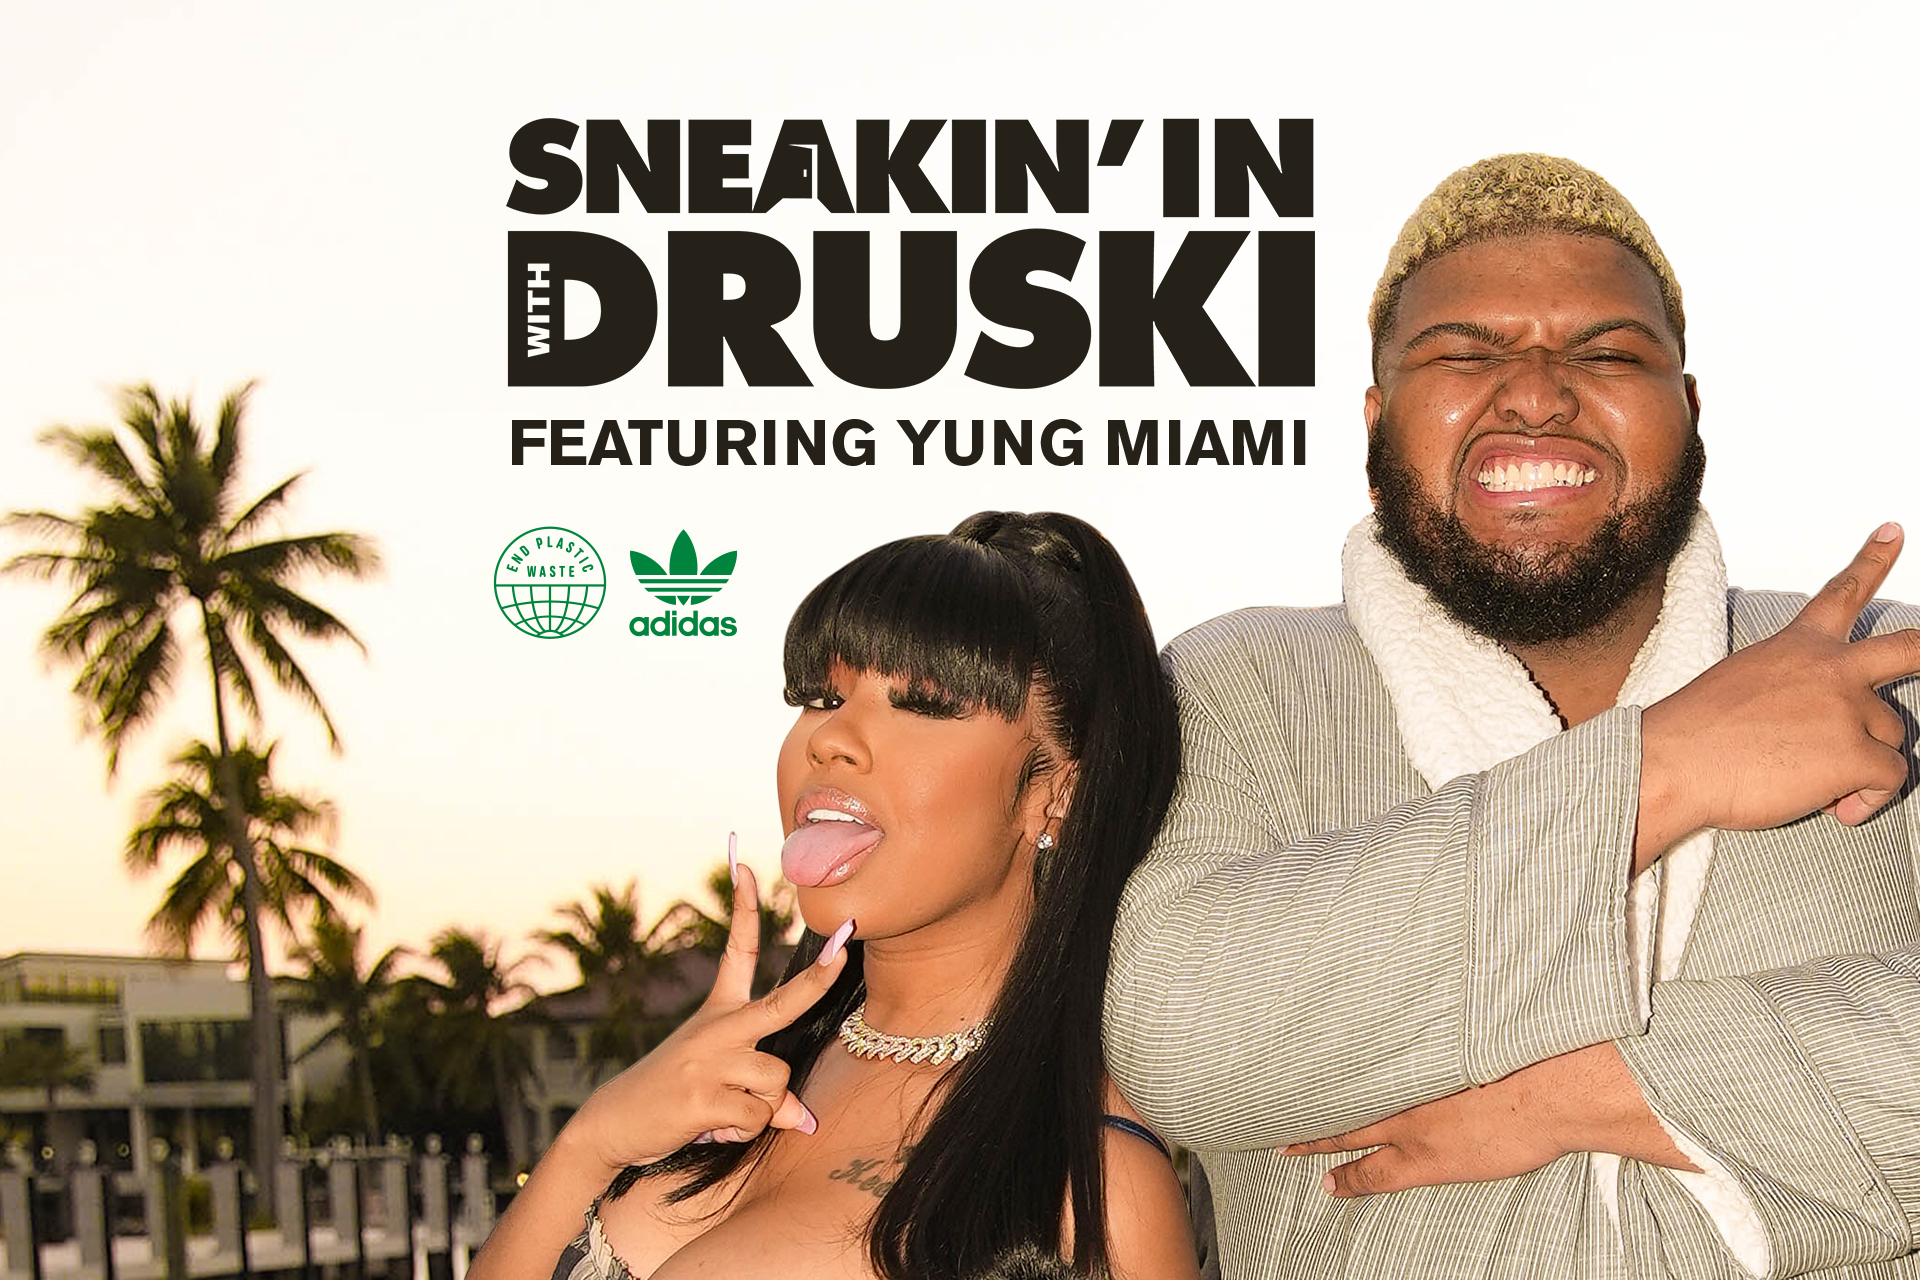 Druski and Yung Miami